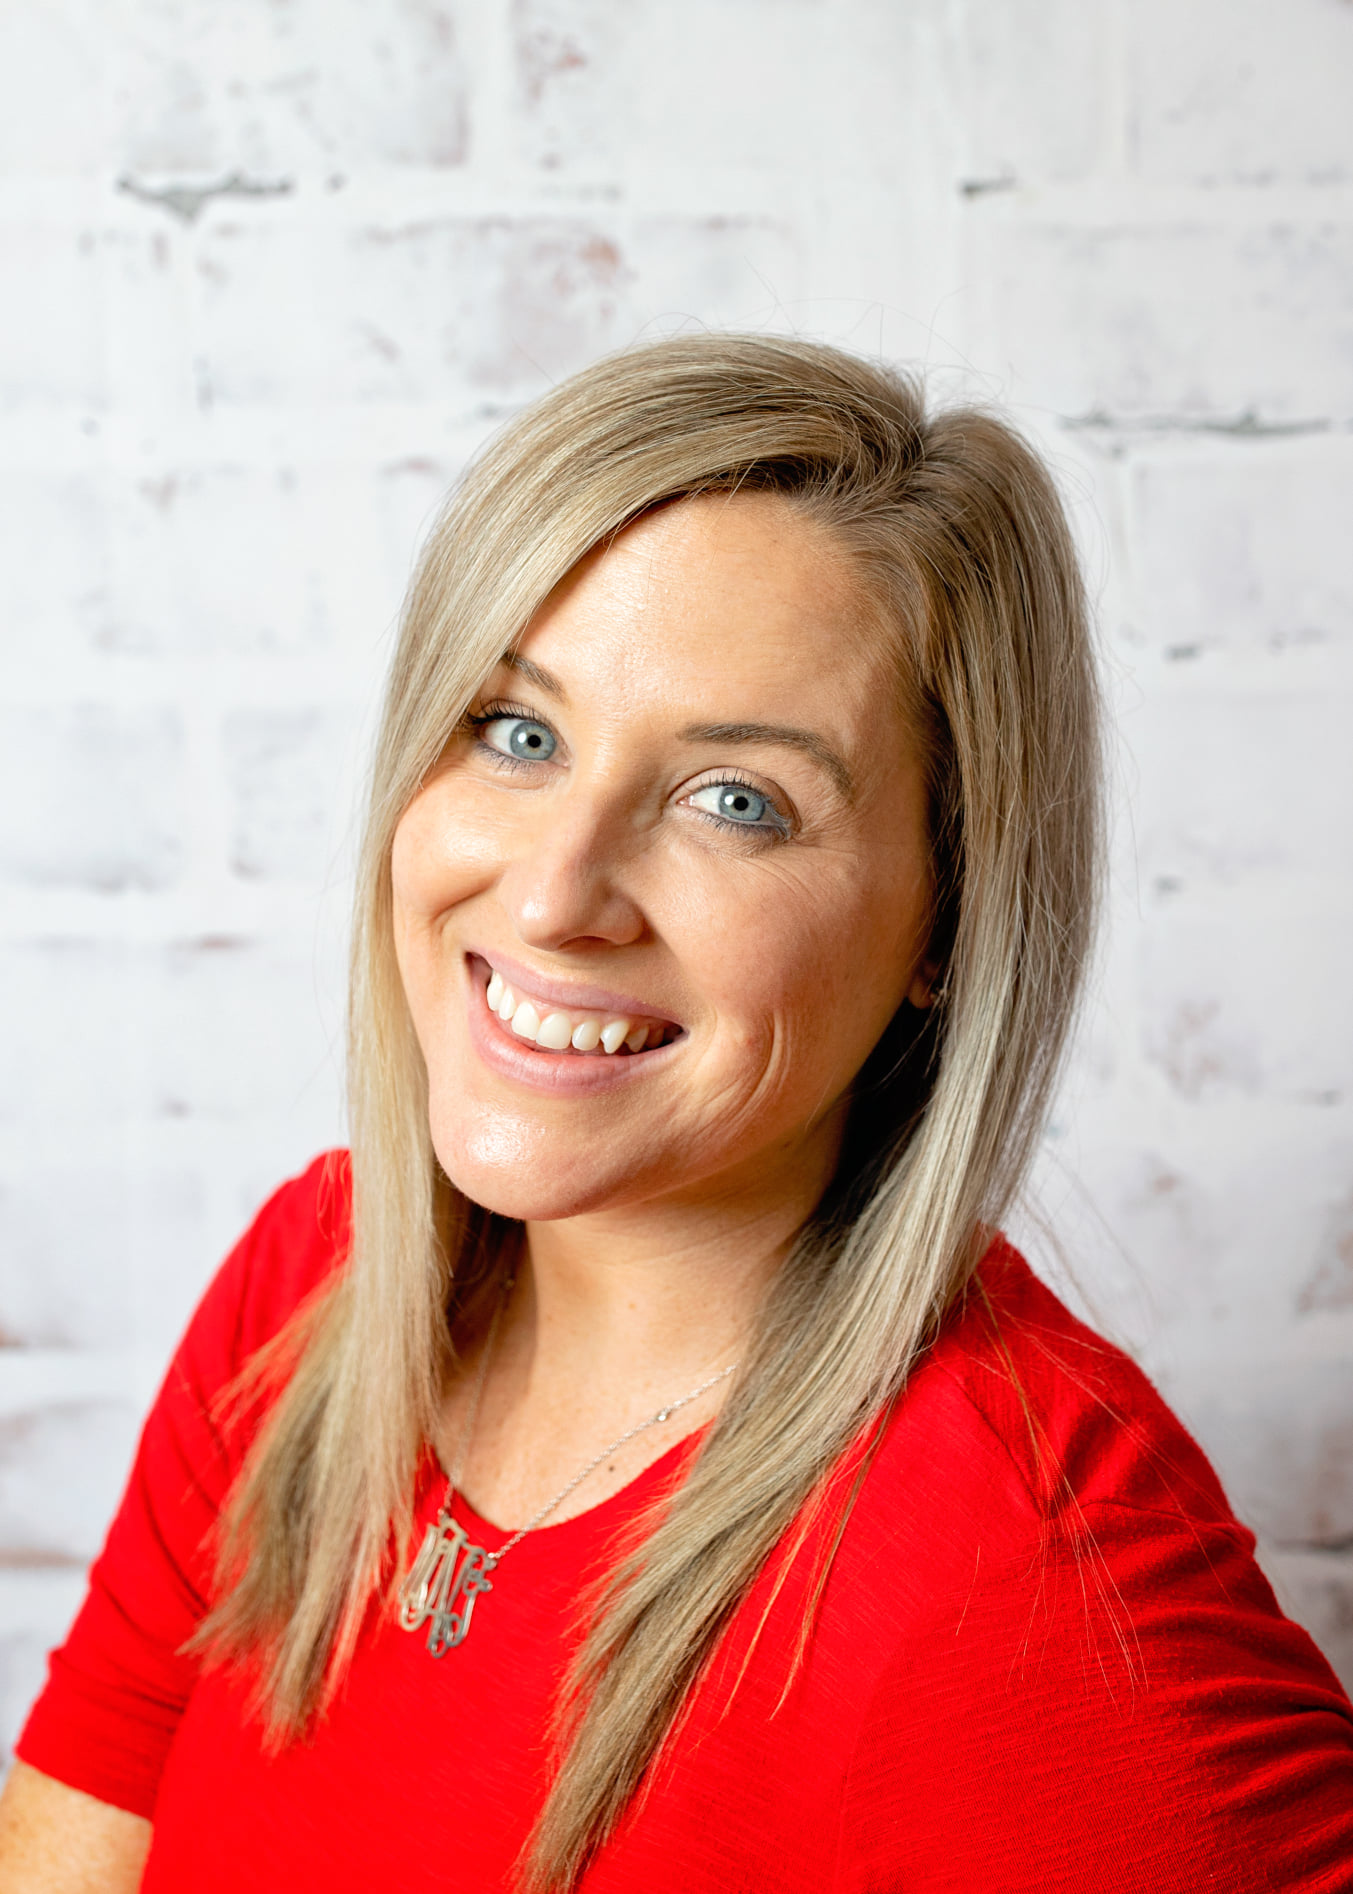 Ms. Melissa Nordholm